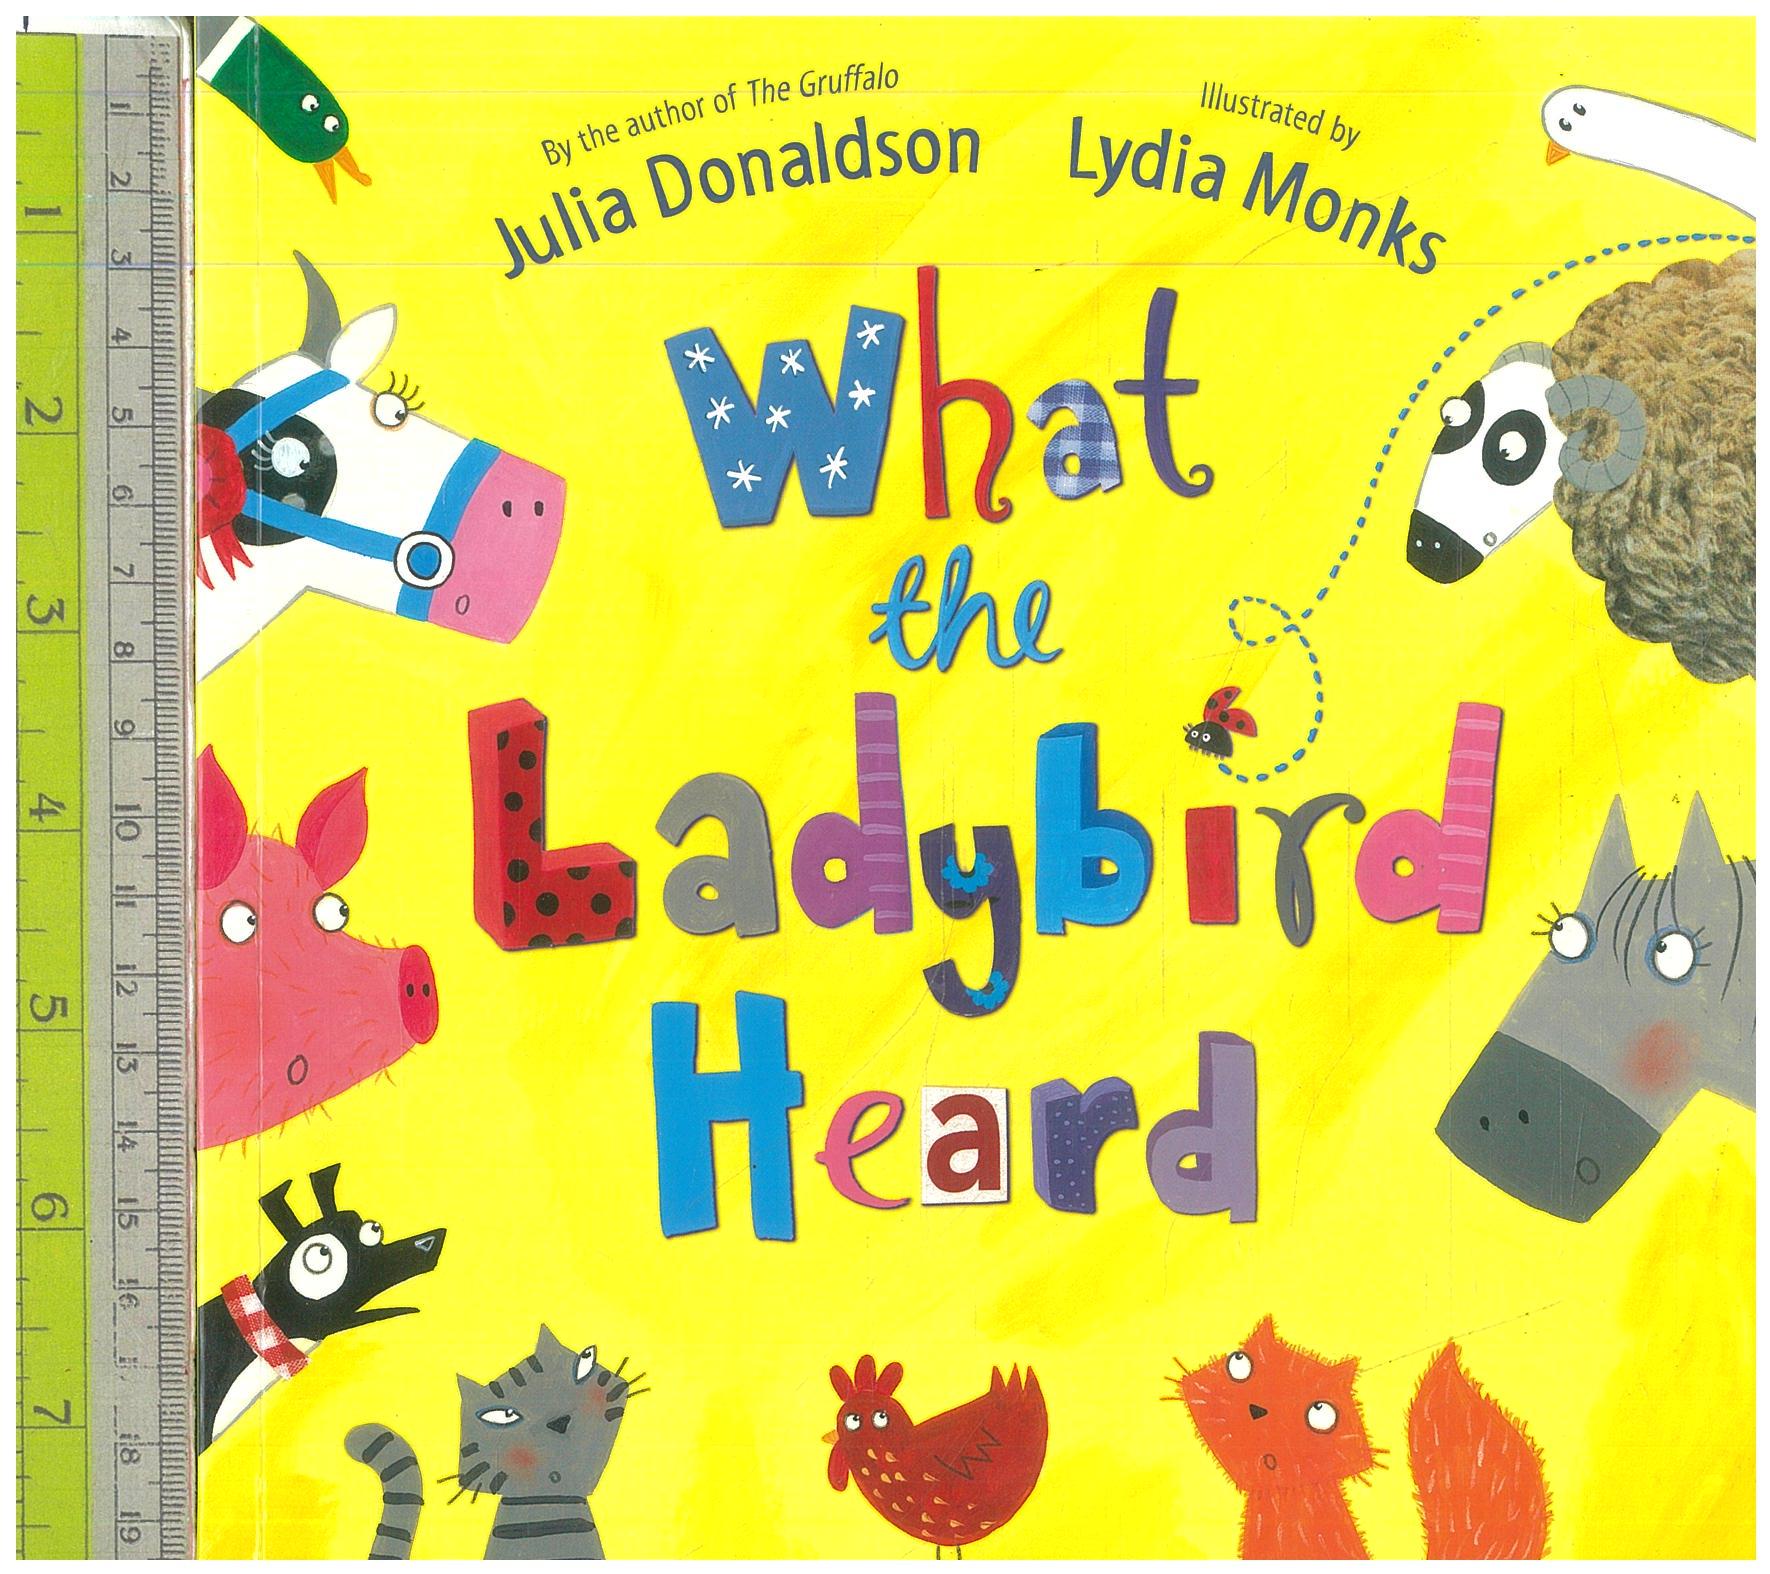 ladybird heard